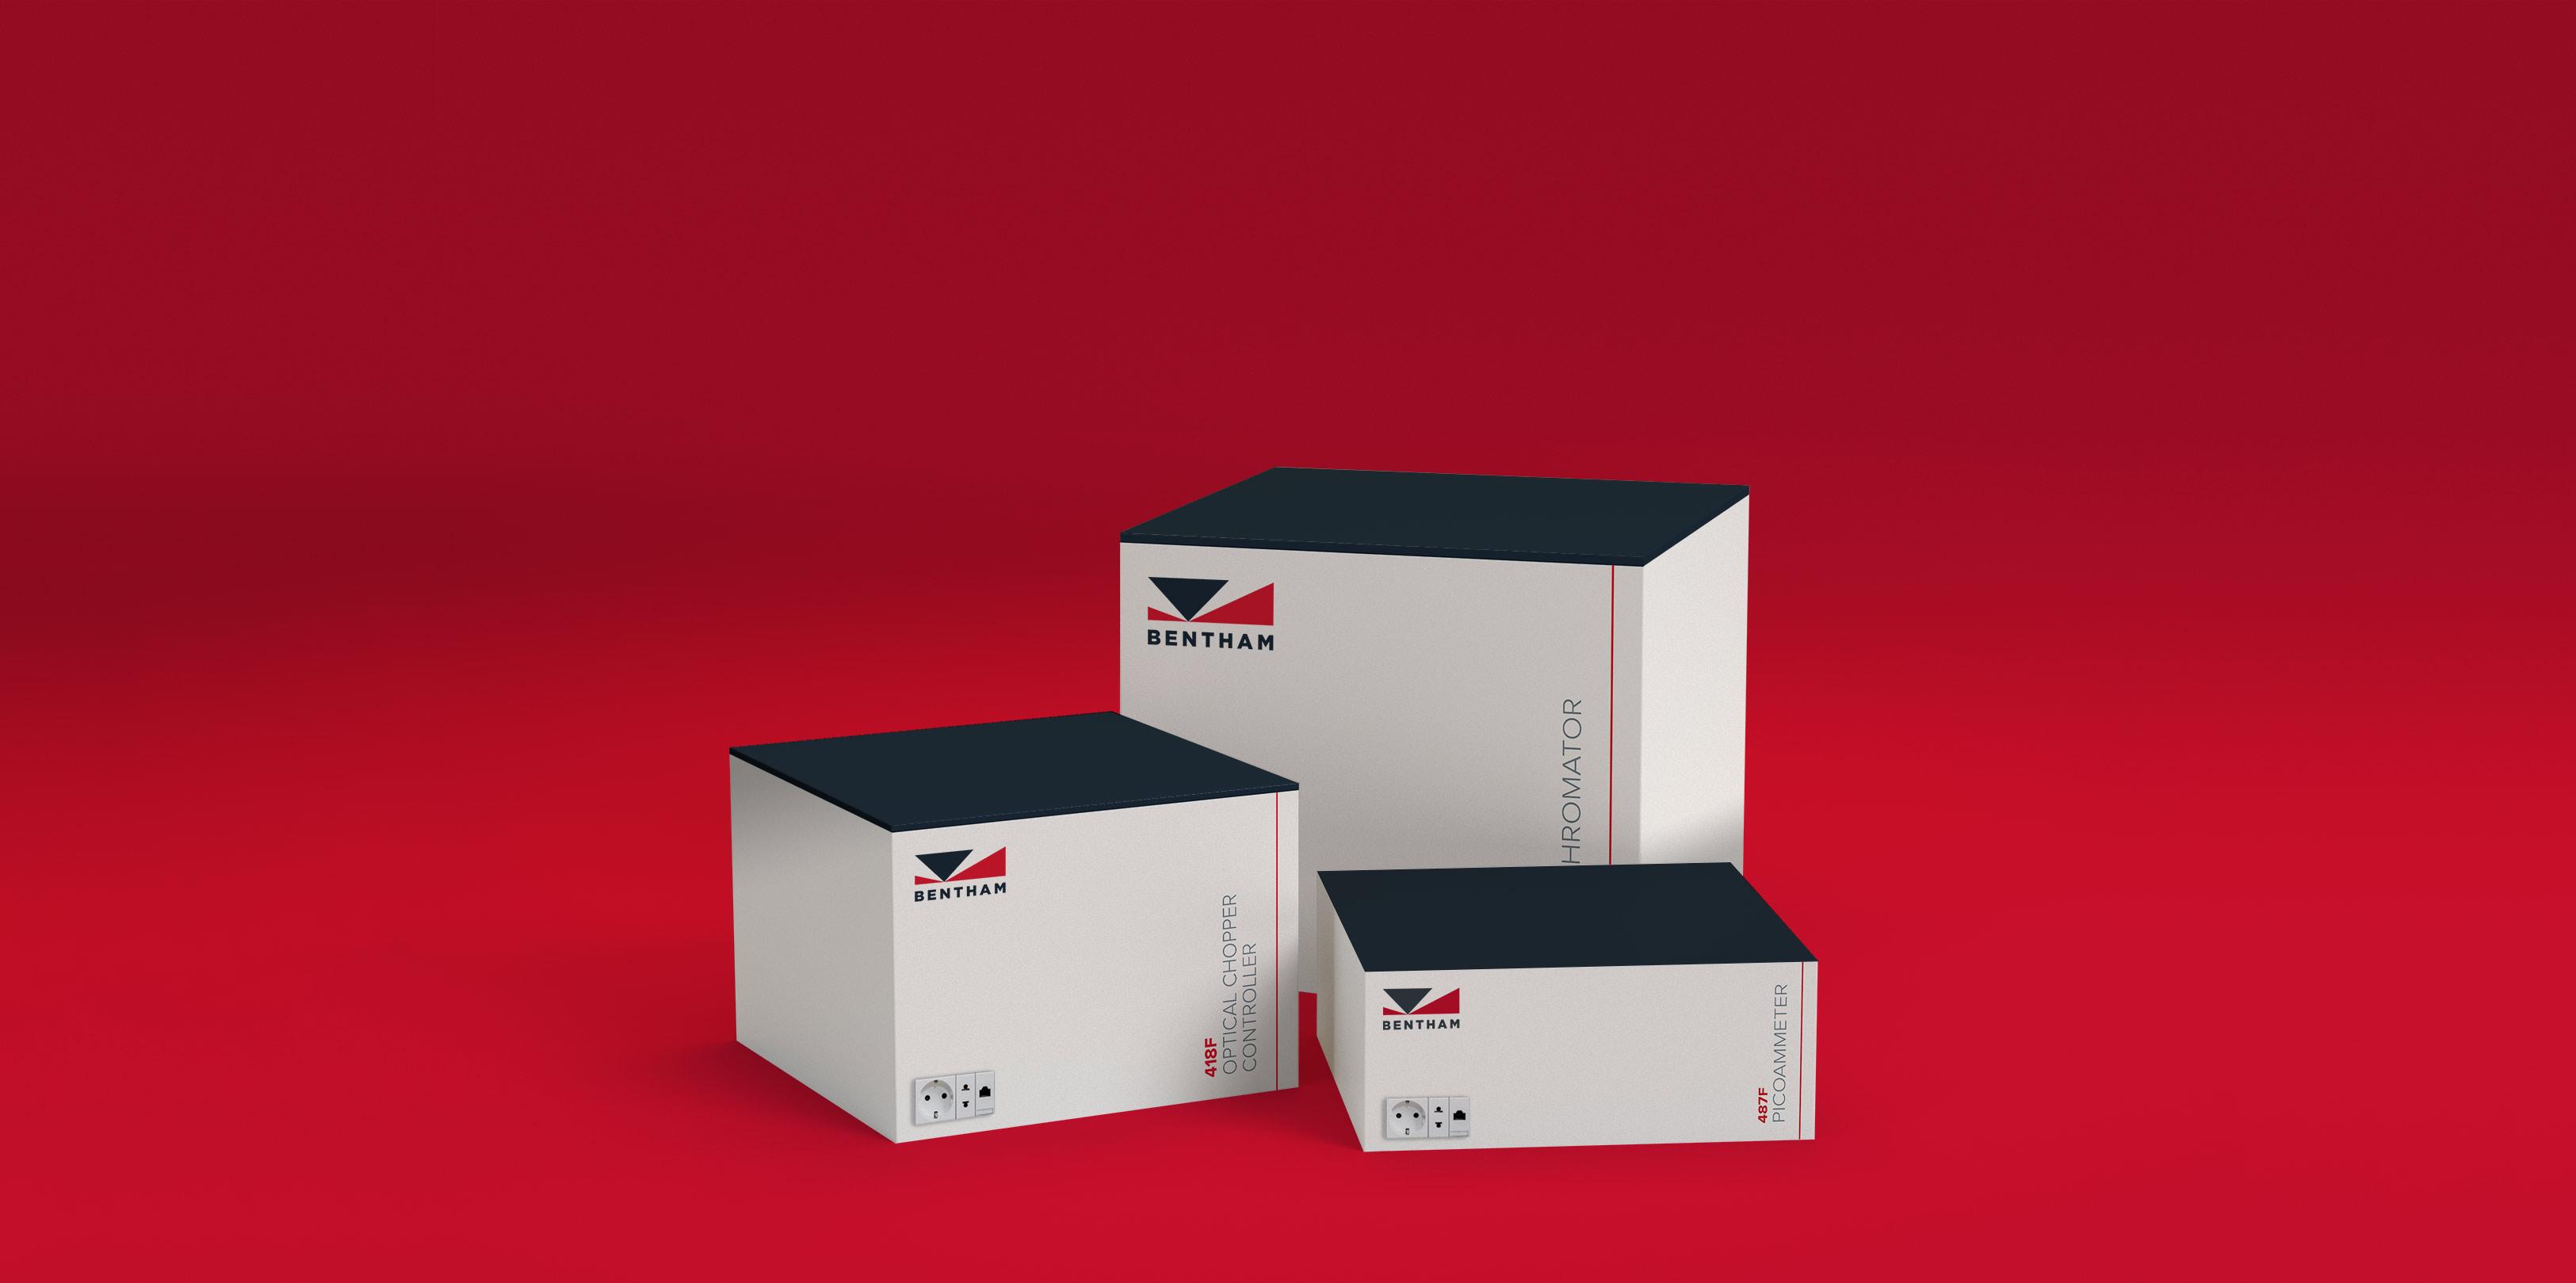 Bentham Box Designs